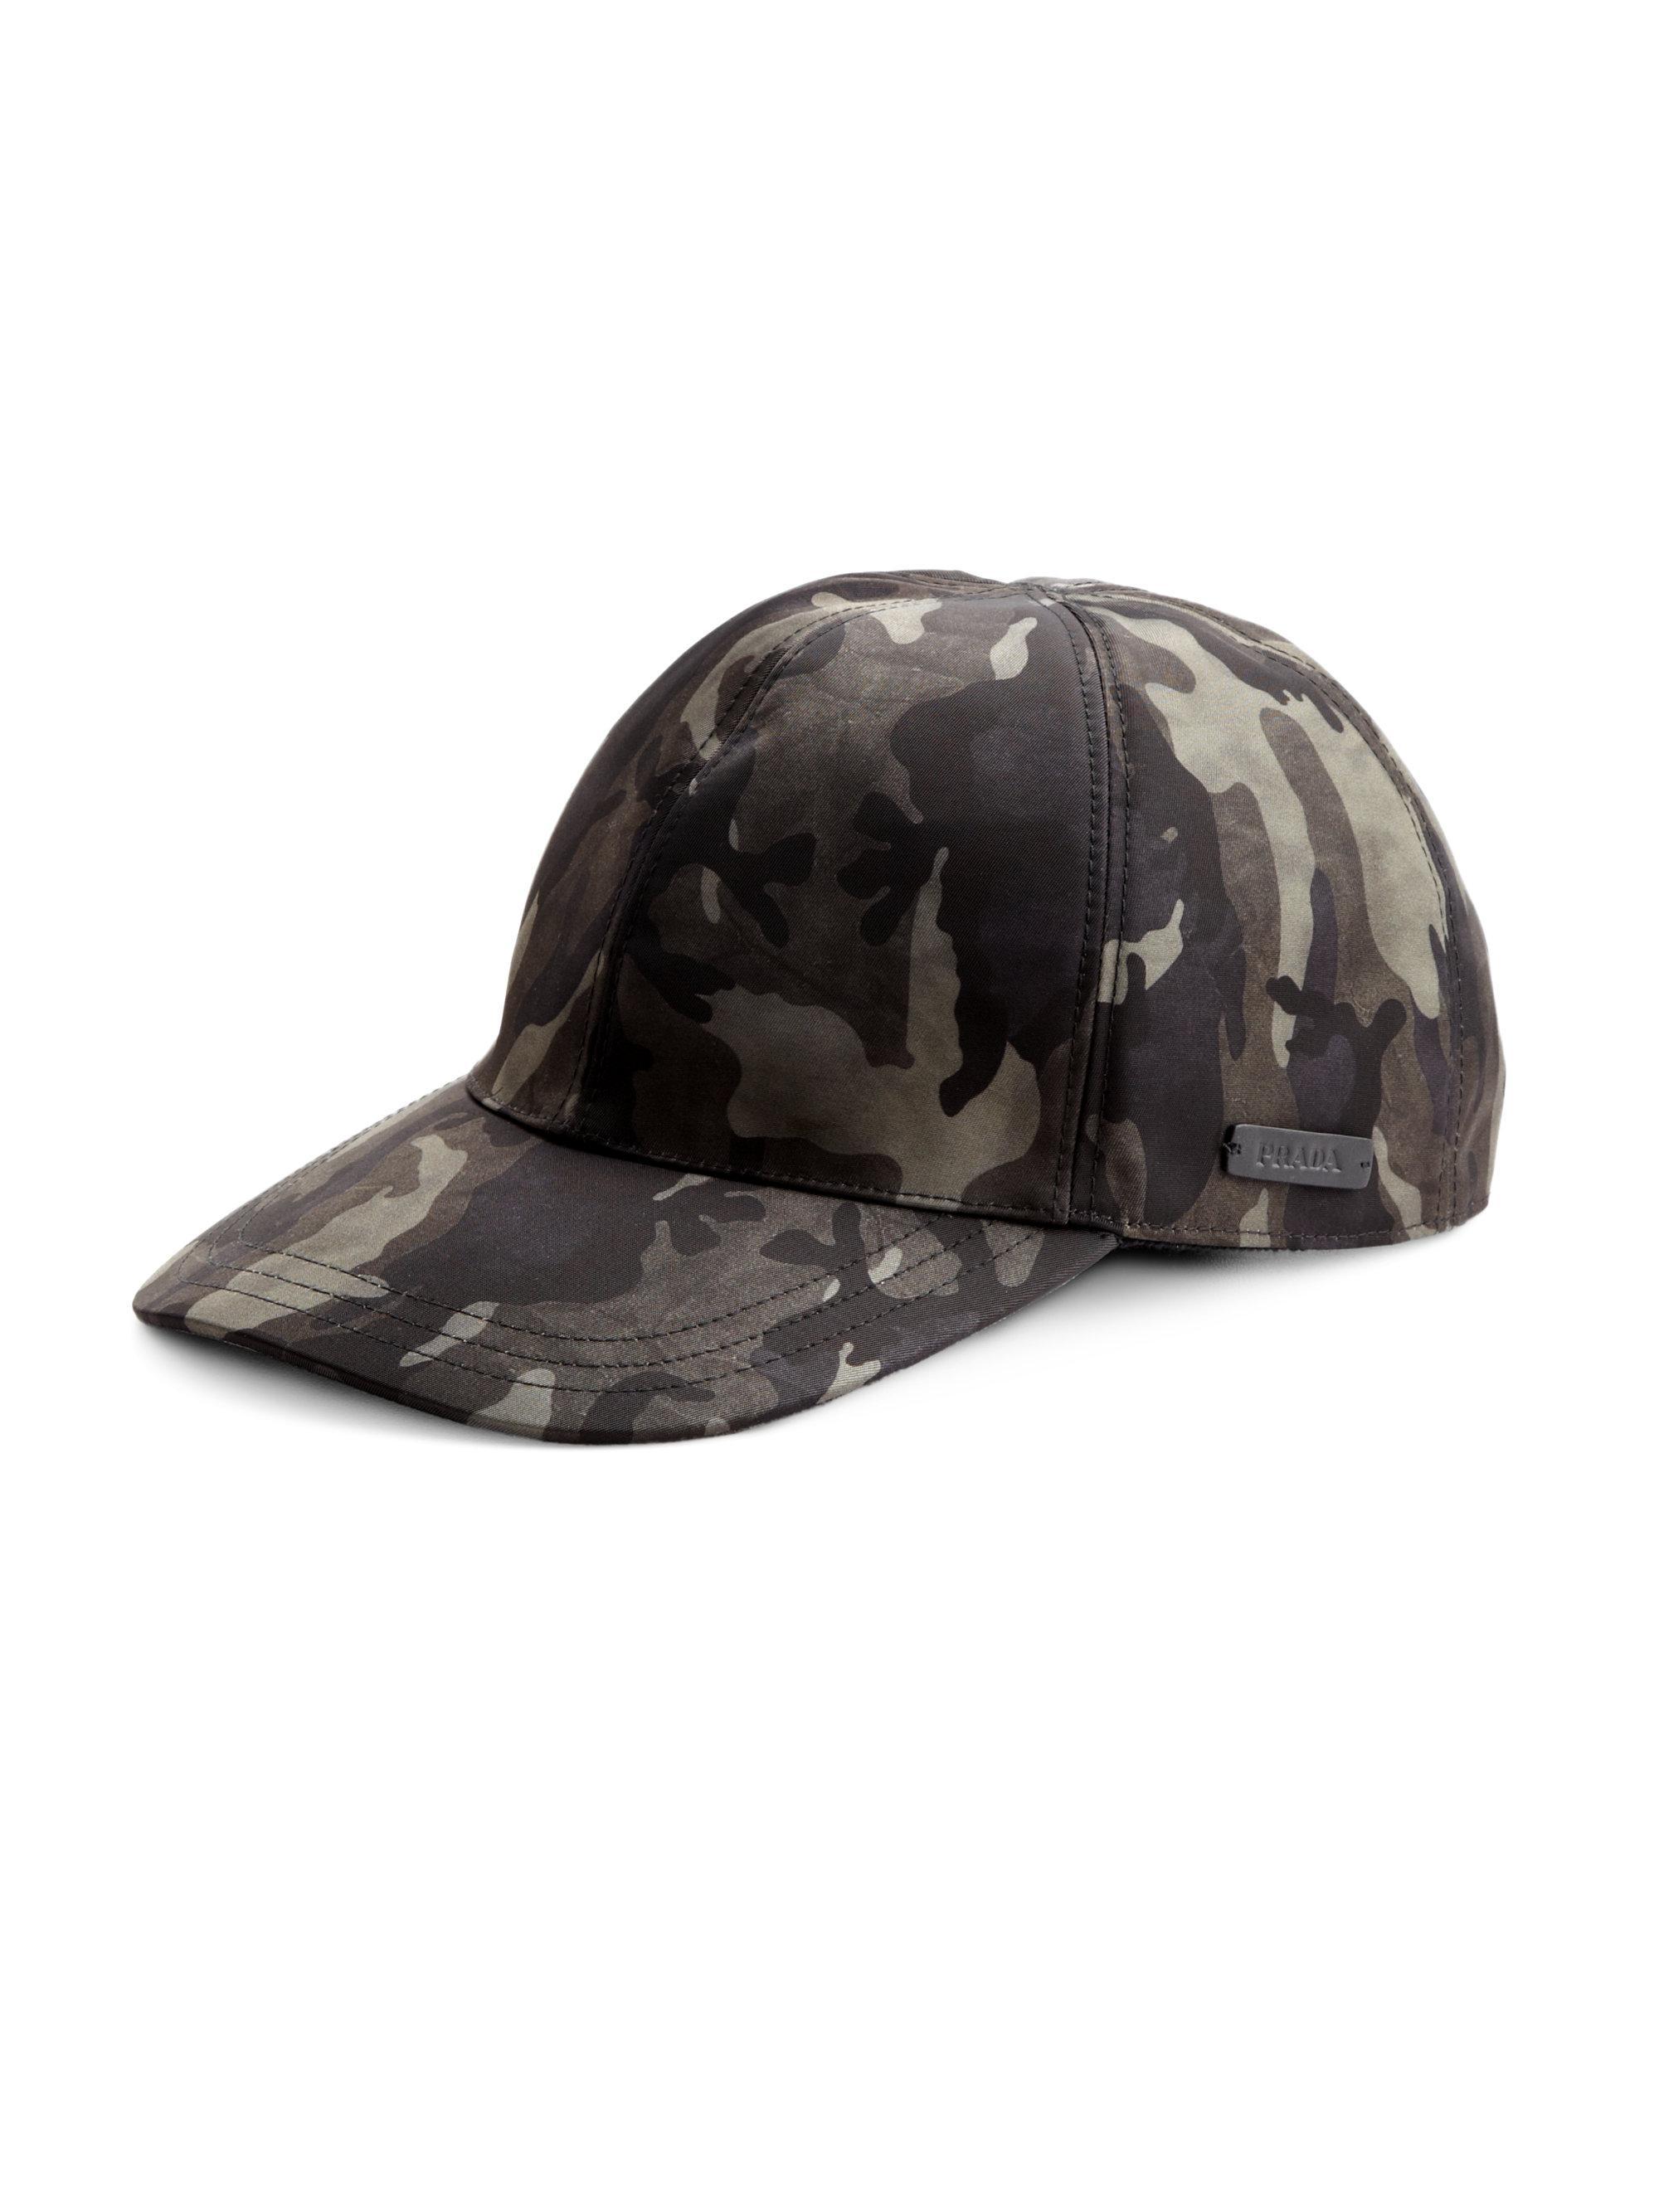 Lyst - Prada Tessuto Camouflage Baseball Cap in Gray for Men 098def4d494e